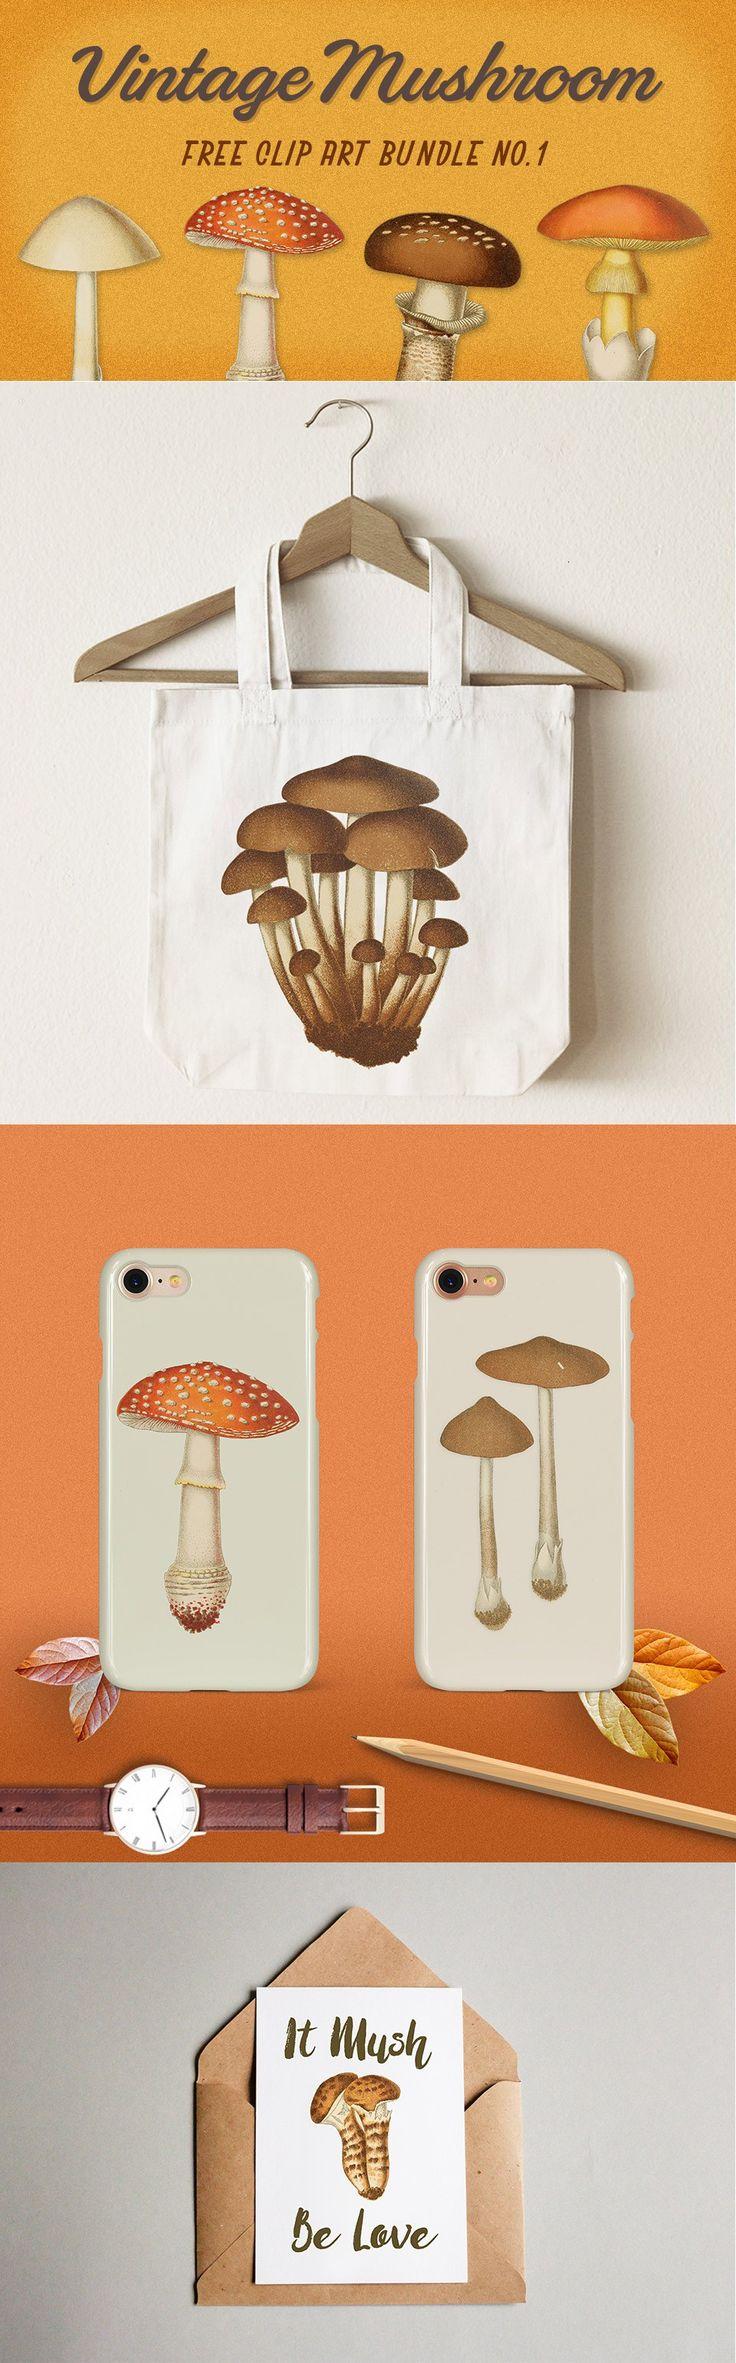 Royalty Free Images | Vintage Mushroom Bundle No. 1 | Oh So Nifty Vintage Graphics